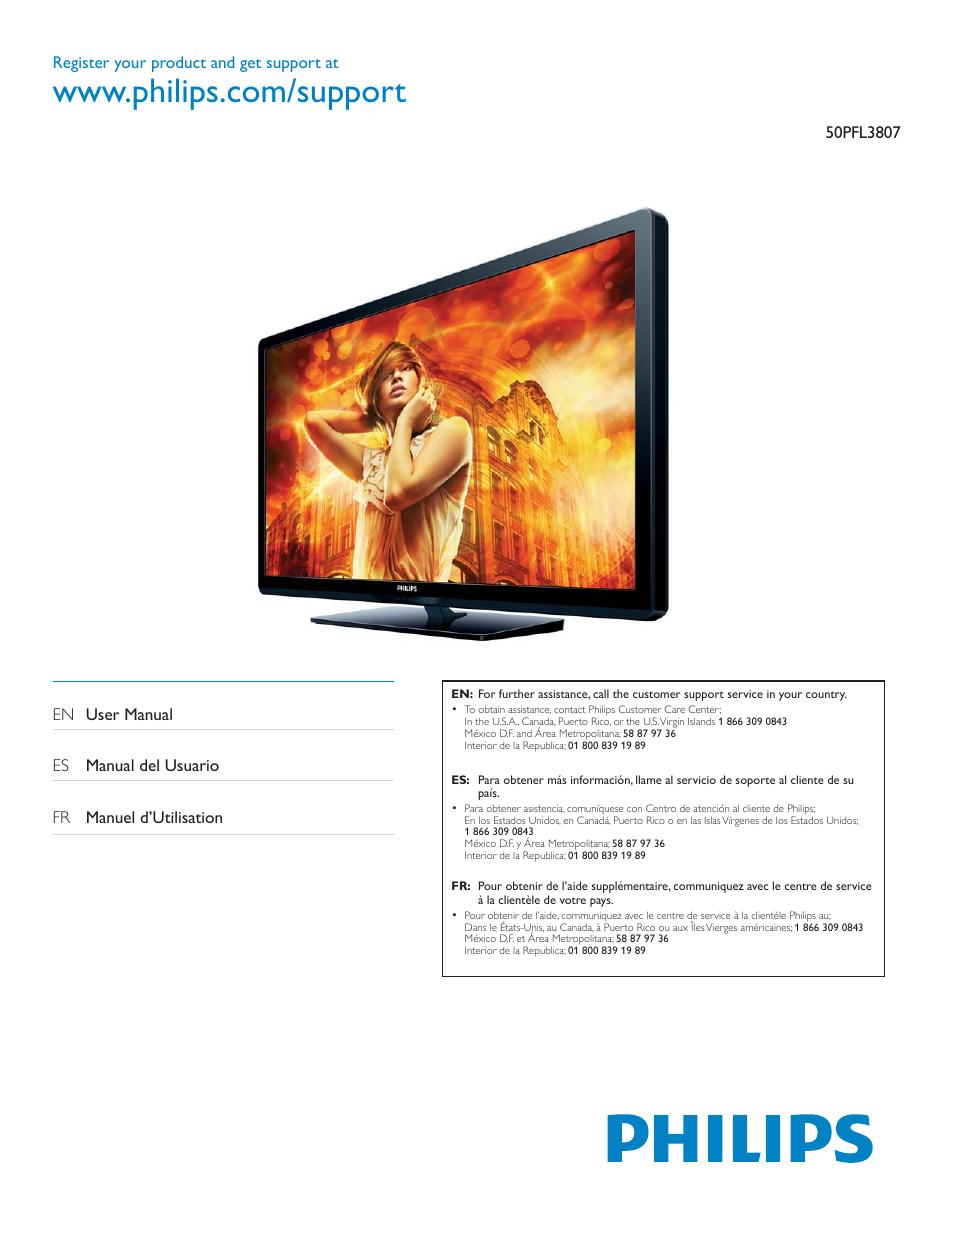 philips 50pfl3807 f7 user manual 67 pages rh manualsdir com Philips TV Manual Philips Flat TV Manual